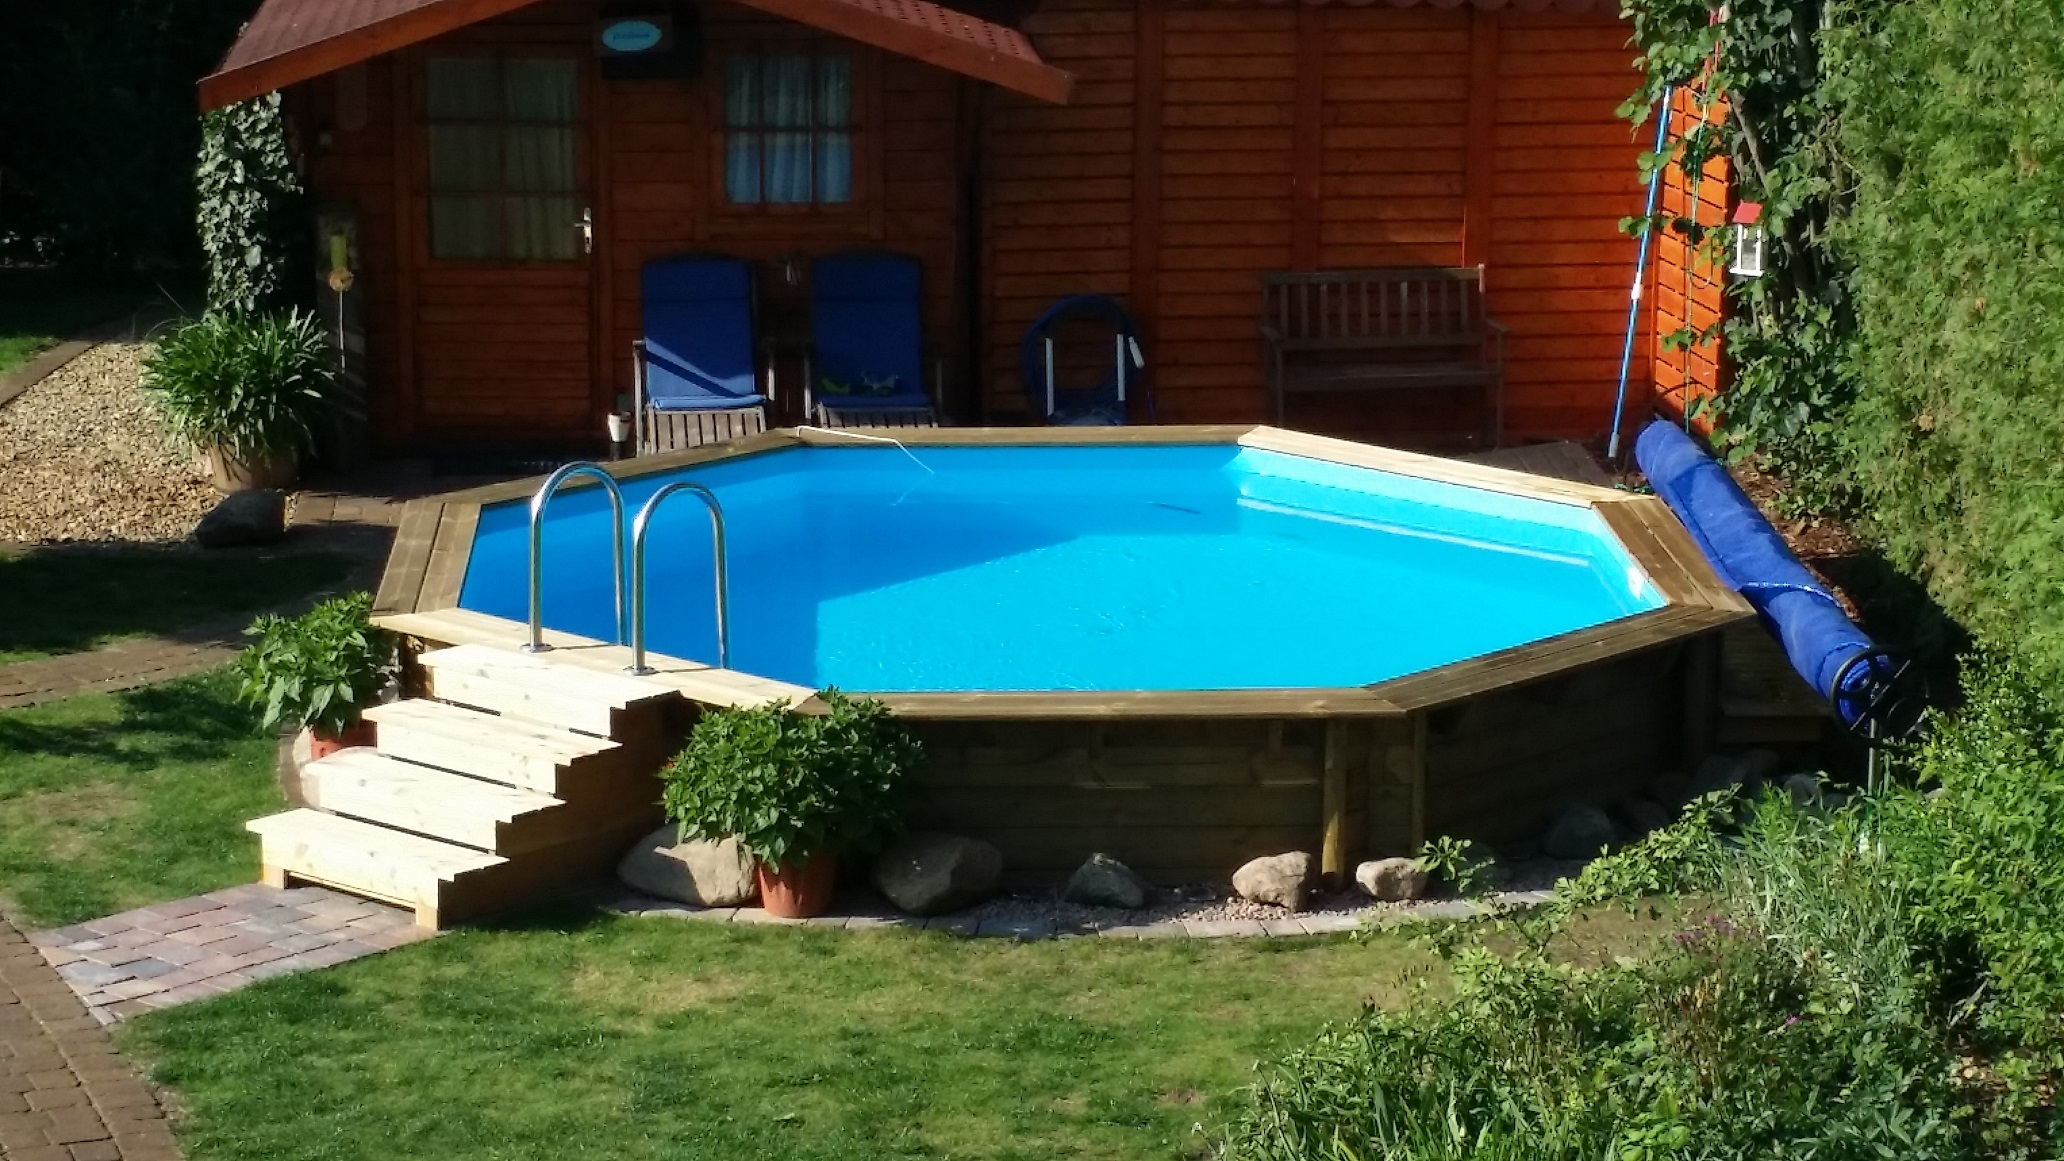 Full Size of Mini Pool Kaufen Holzpool Sets Aus Massivholz Zum Selbstbau Betten 140x200 Küche Günstig Mit Elektrogeräten Bett Paletten Bad Ikea Miniküche Kühlschrank Wohnzimmer Mini Pool Kaufen